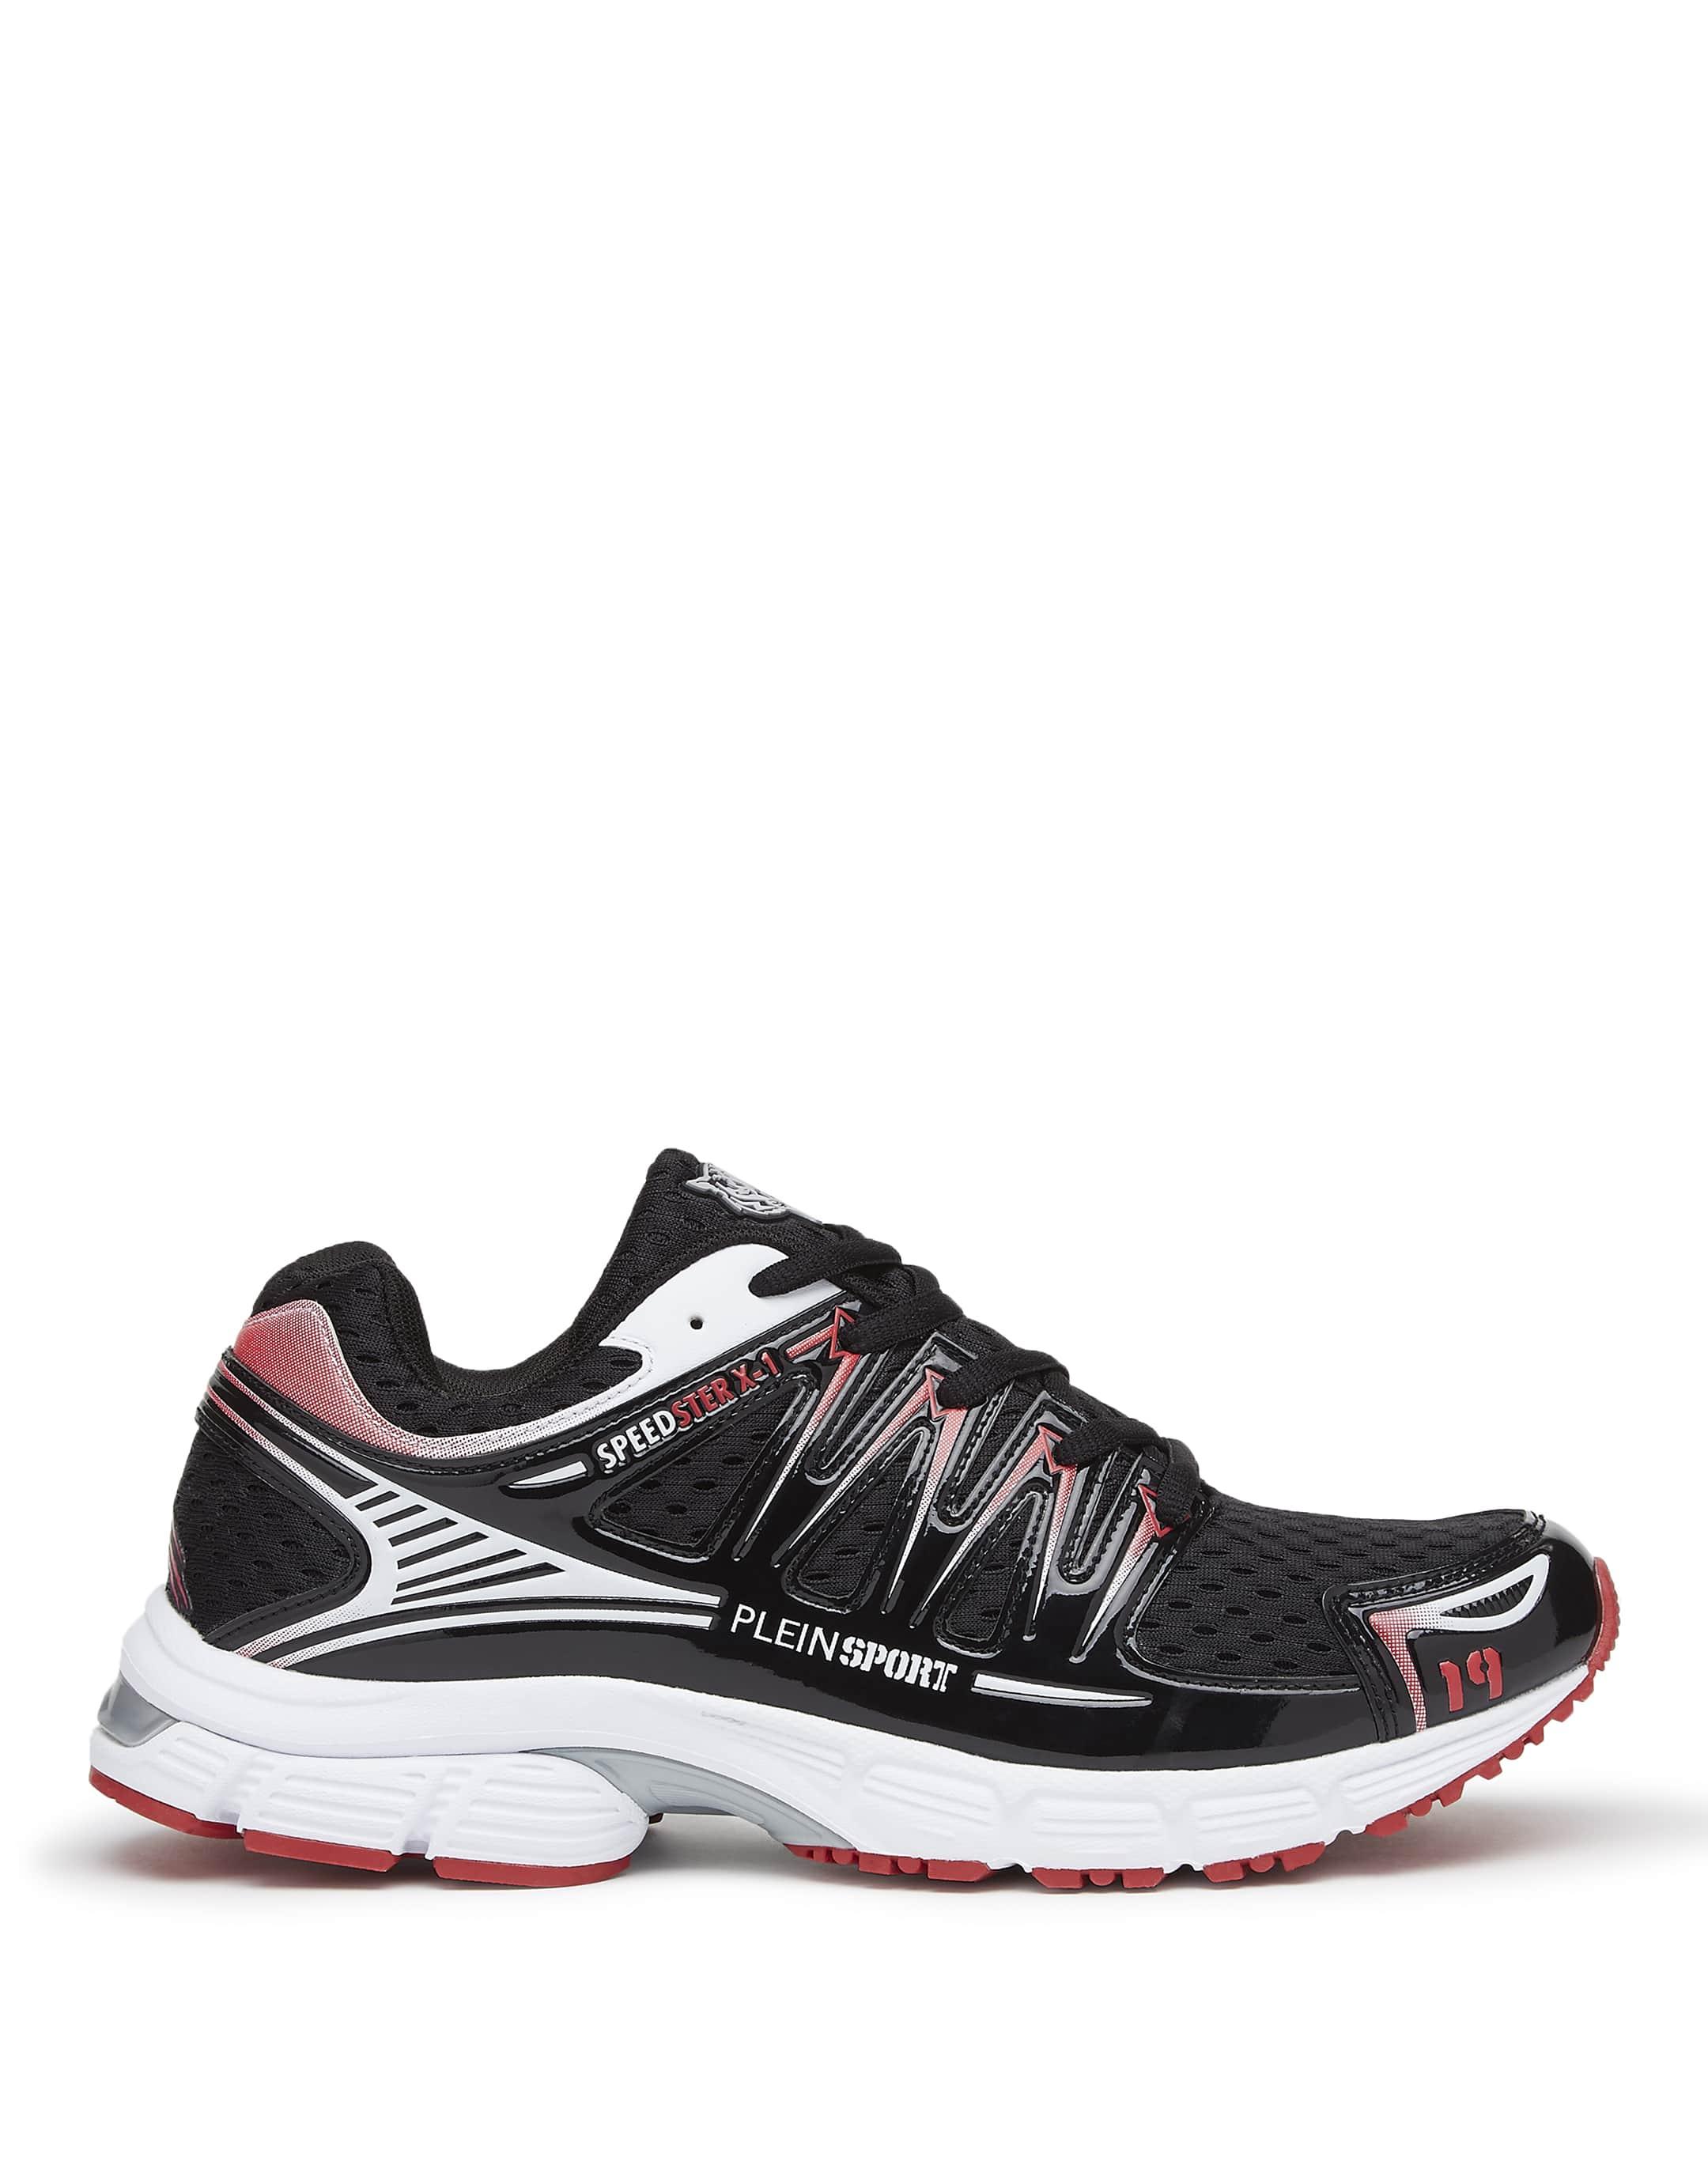 Manuel Runner sneakers - Black Plein Sport TY7S11j